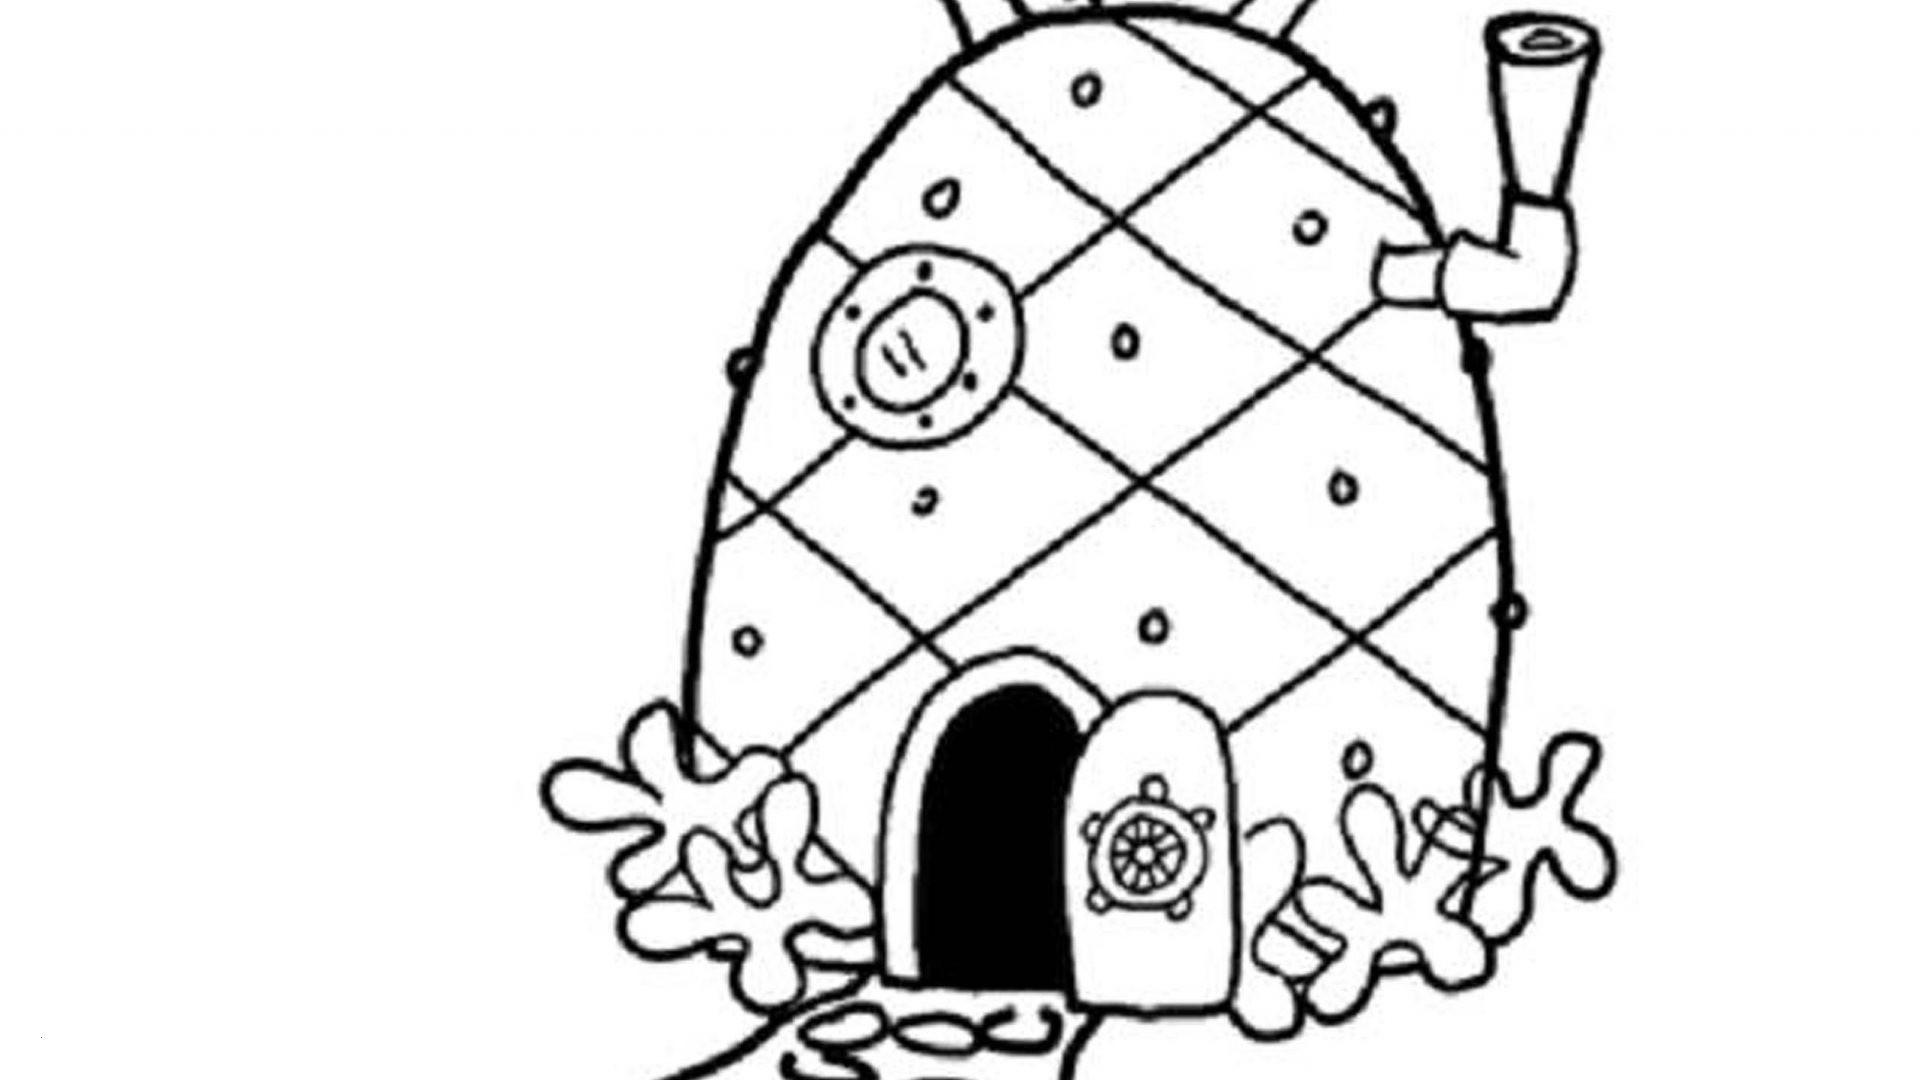 Spongebob Bilder Zum Ausmalen Genial Spongebob Squarepants Coloring Pages Free Eskayalitim Inspirierend Sammlung